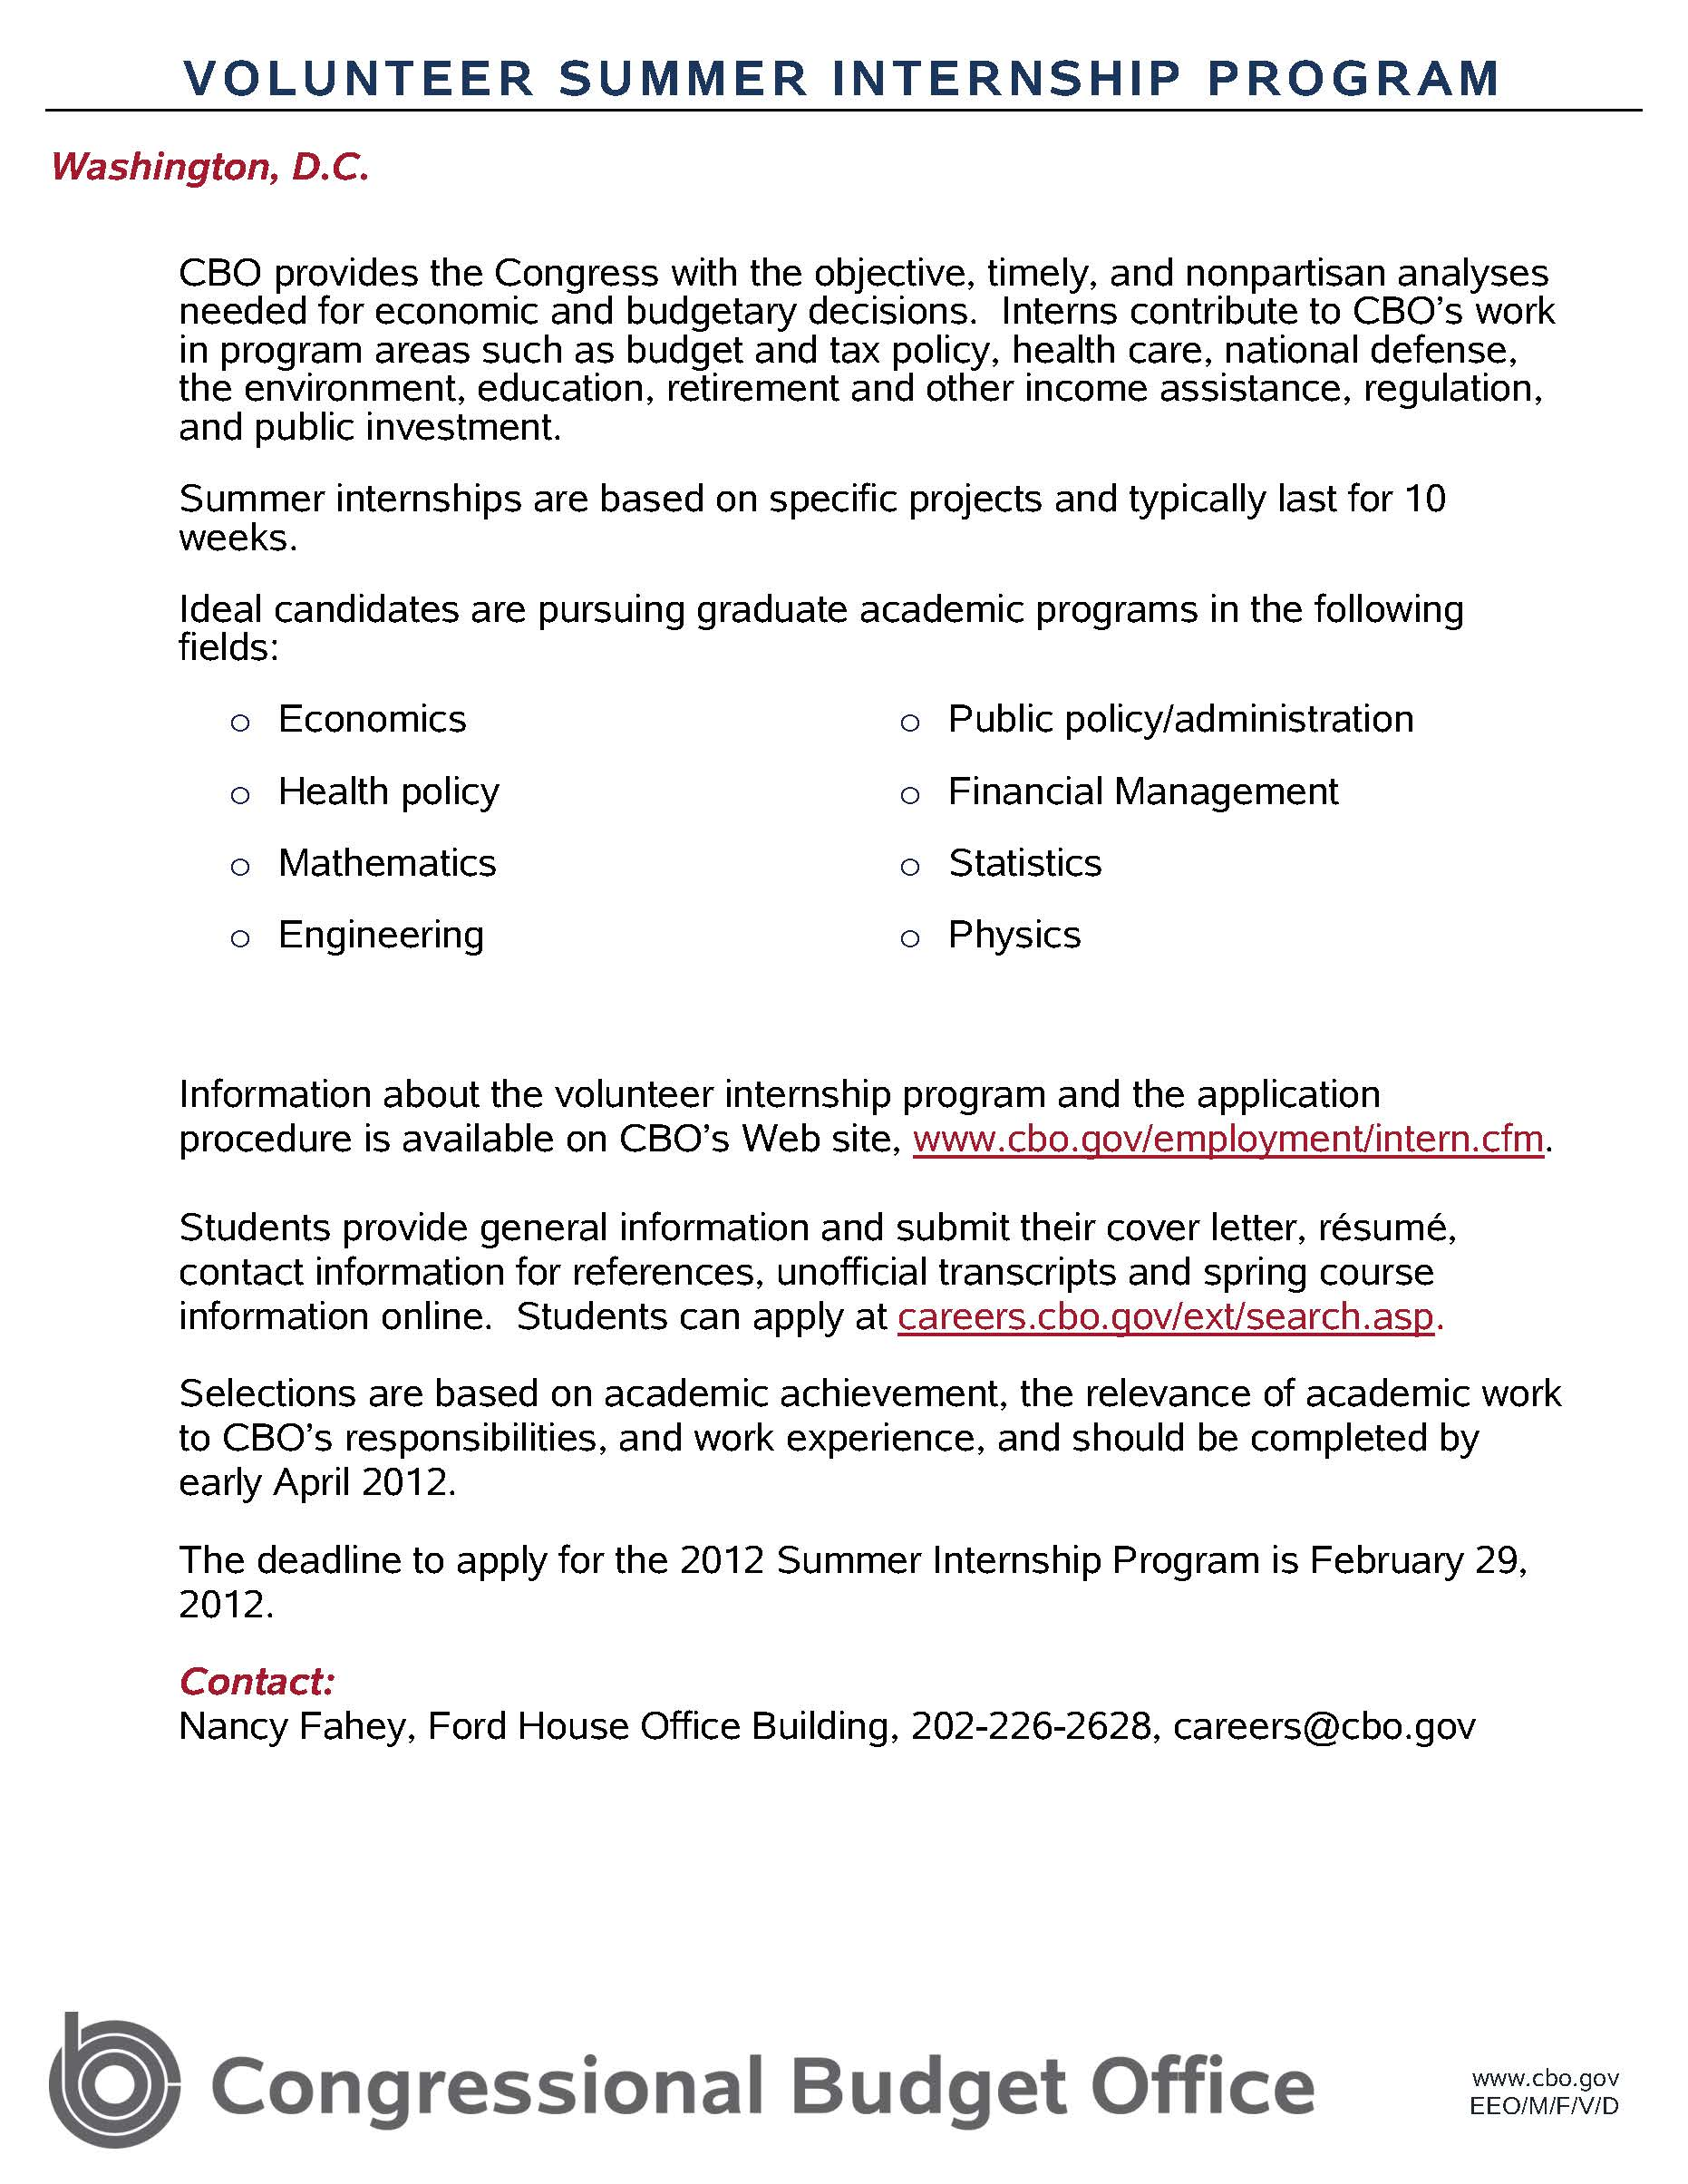 indiana university application open